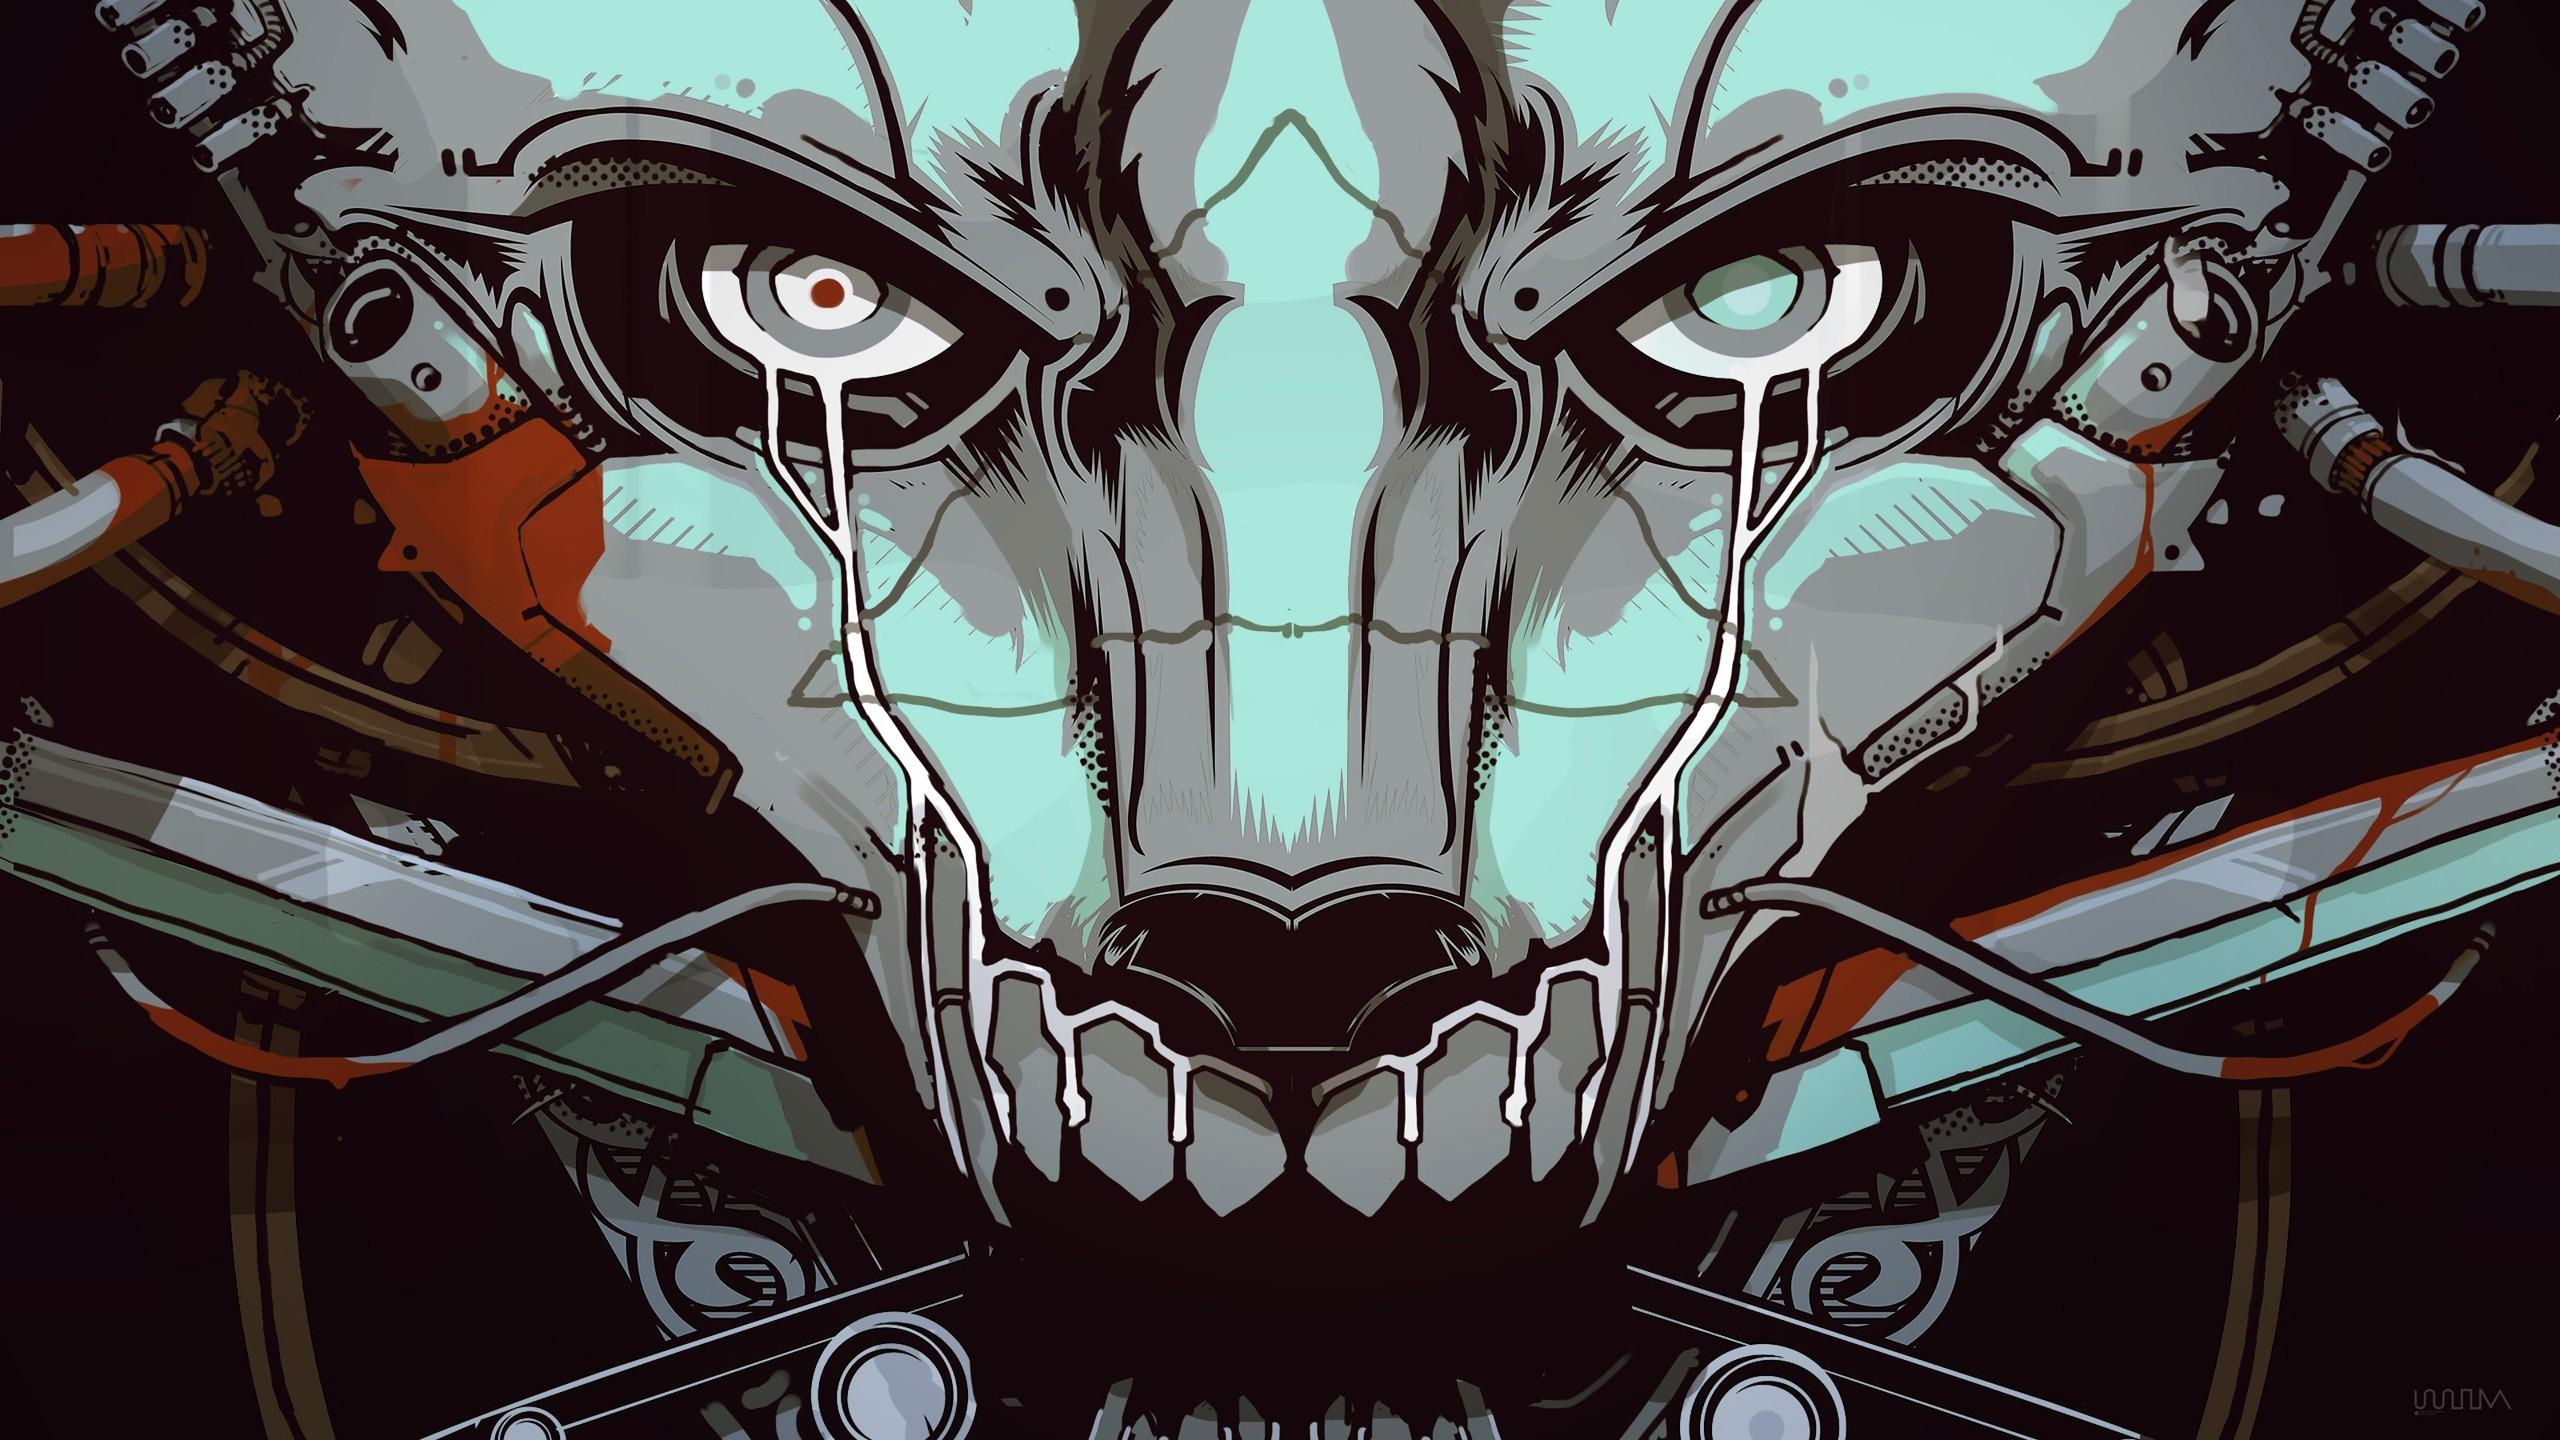 Simple Wallpaper Music Skull - illustration-digital-art-cyberpunk-anime-robot-futuristic-artwork-music-skull-cyborg-machine-comics-comics-artist-comic-book-215605  Image_94322.jpg